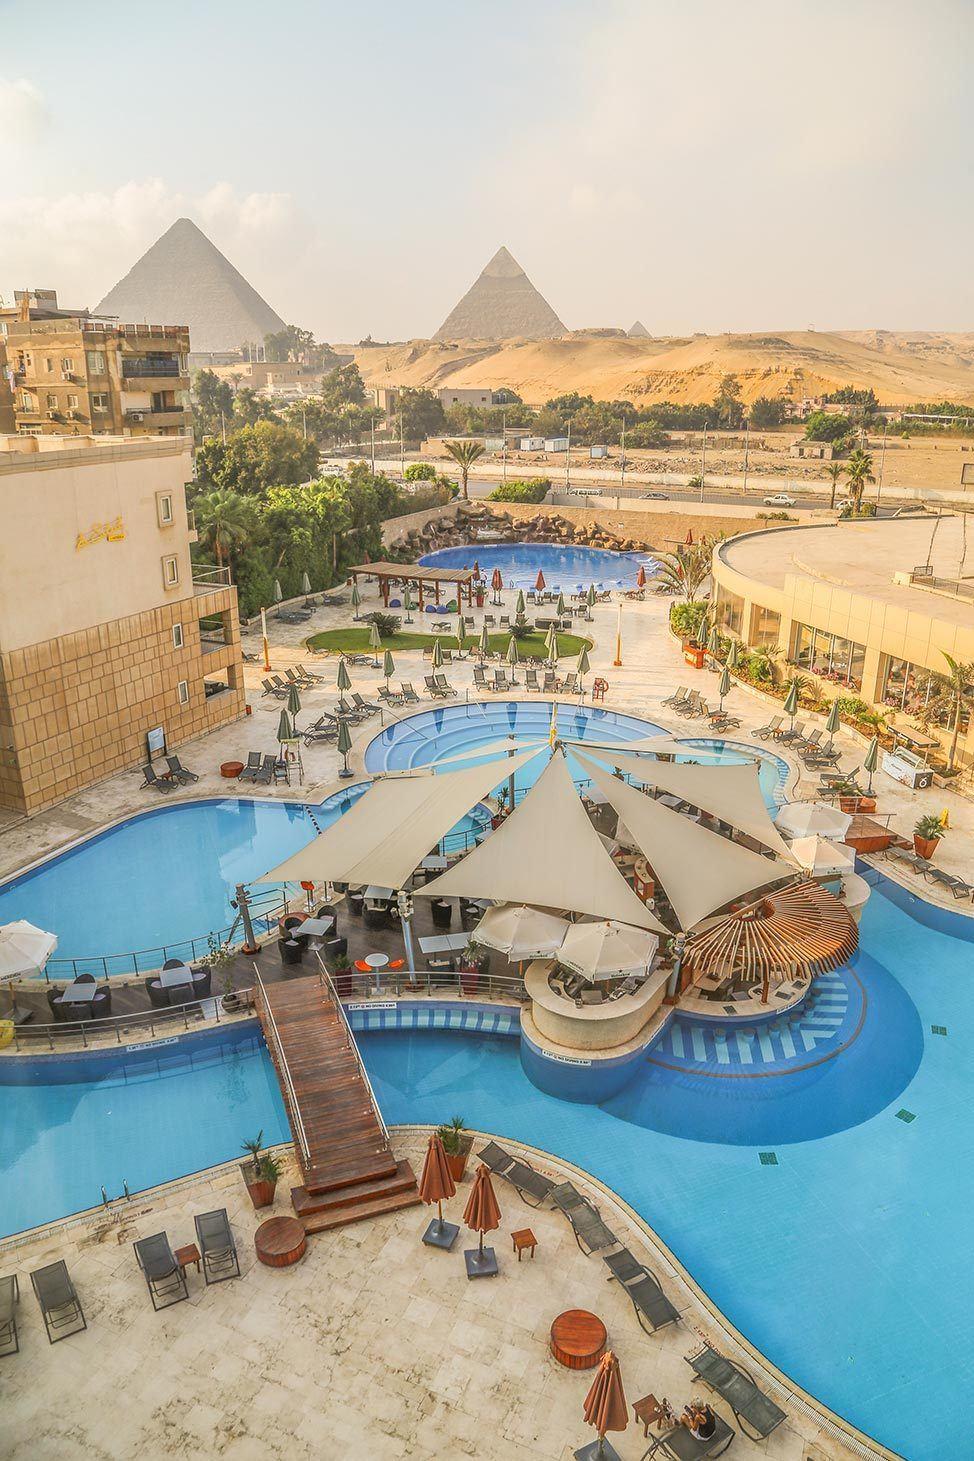 Le Meridien Pyramids in Cairo